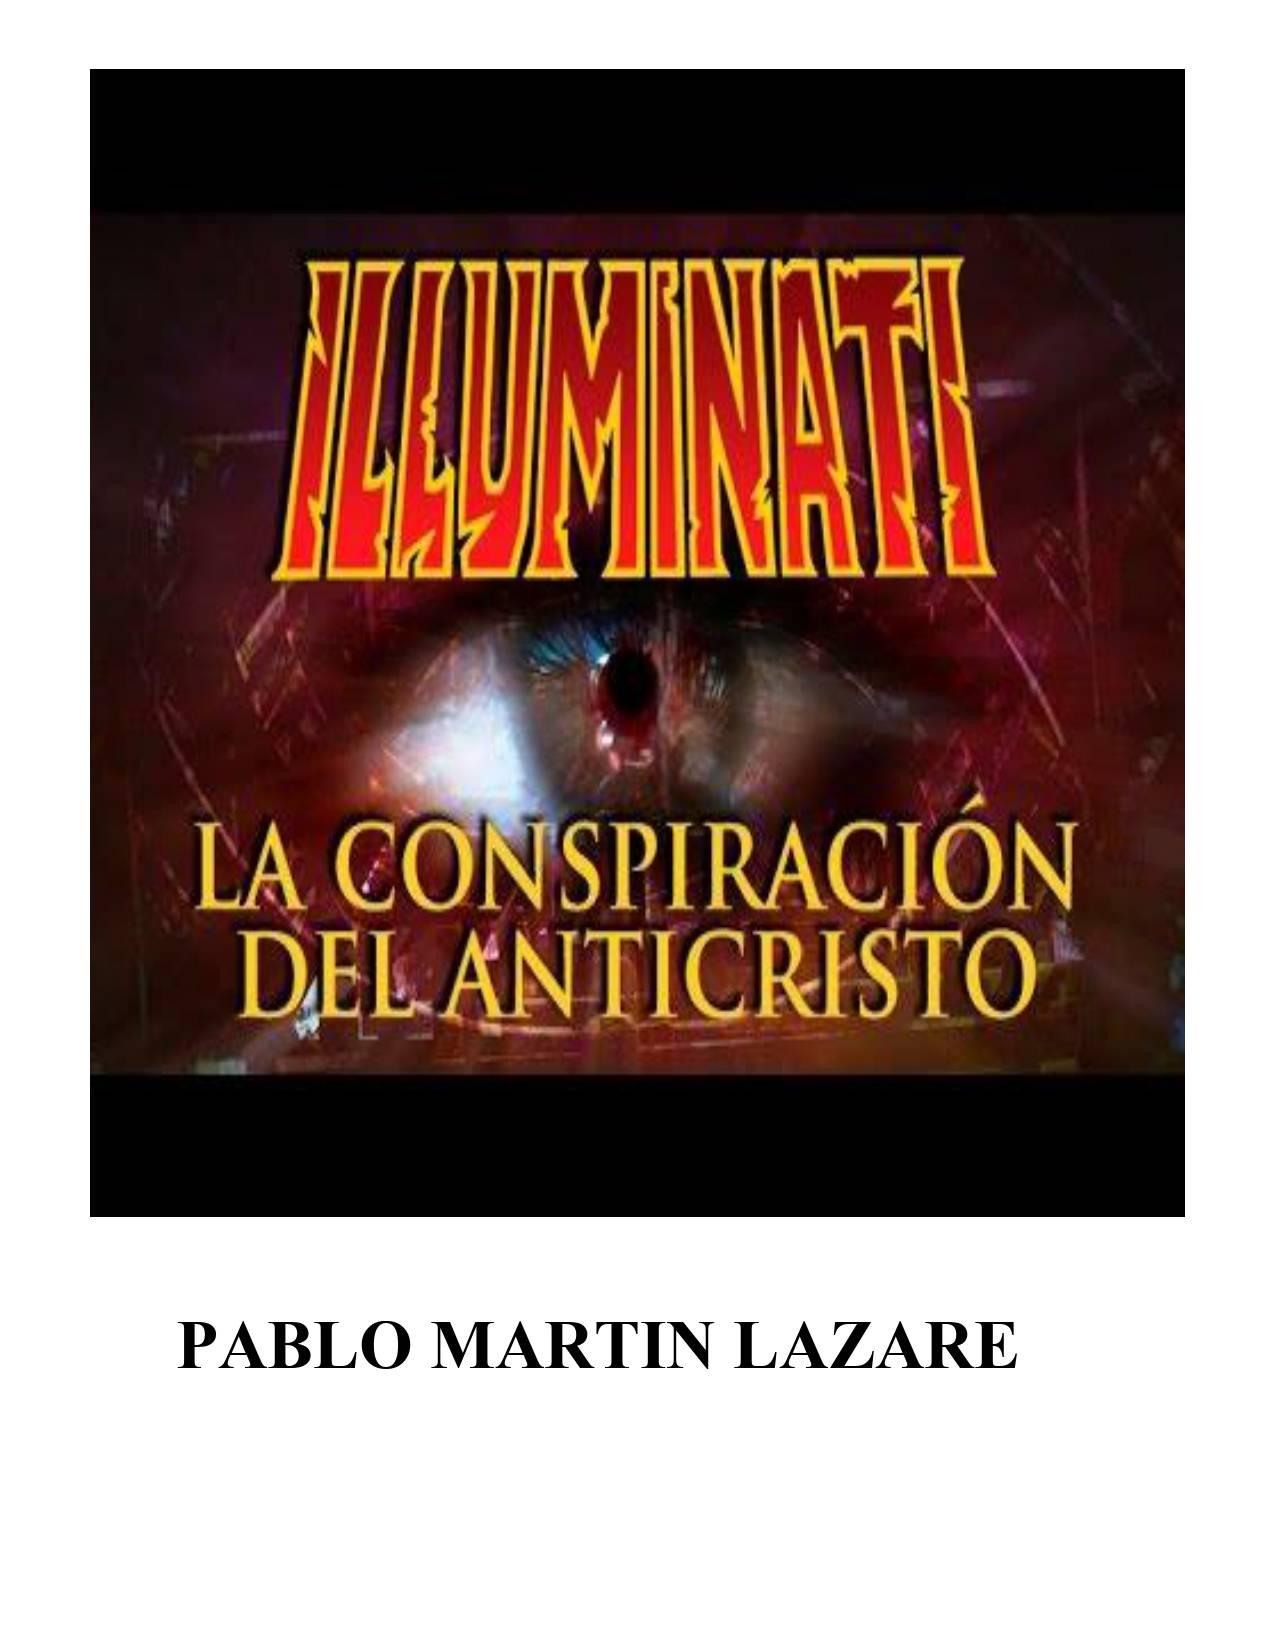 ILLUMINATI Y LA CONSPIRACION DEL  ANTICRISTO_pages-to-jpg-0001.jpg